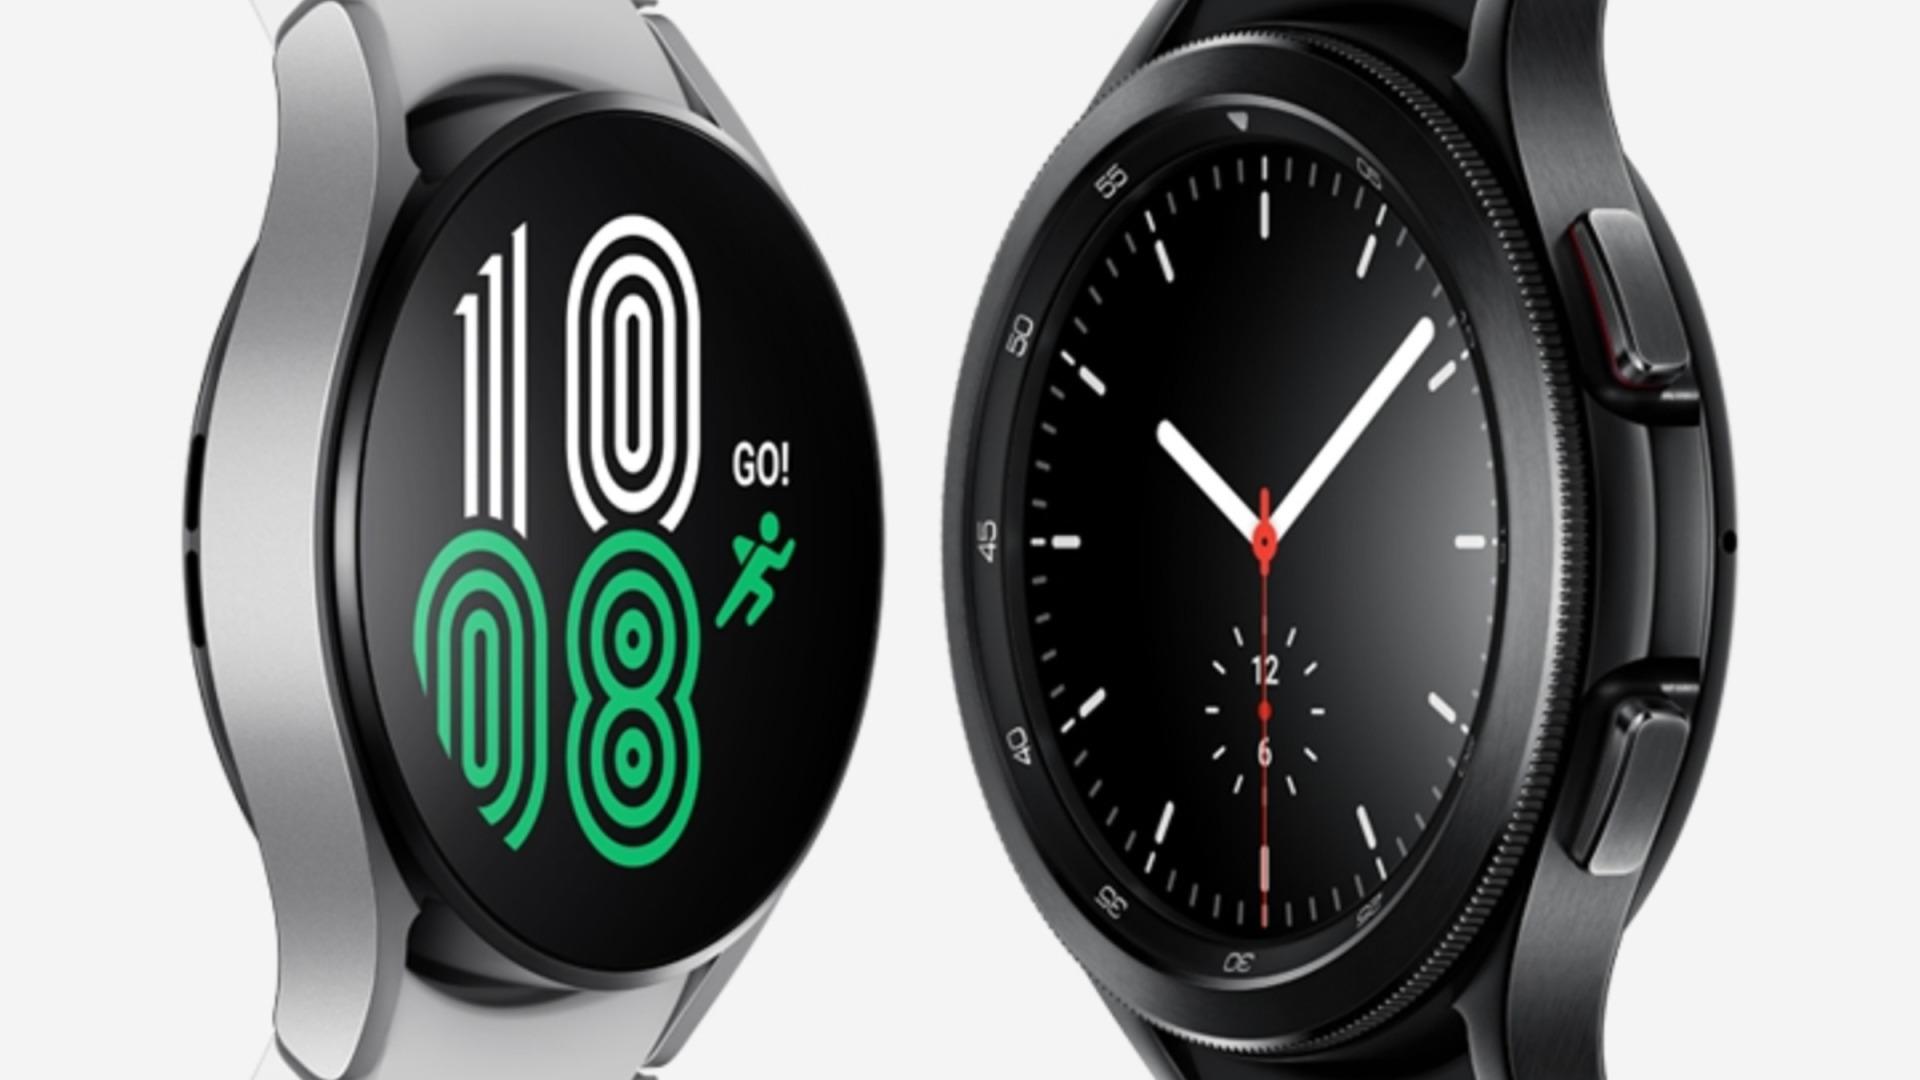 Google, smartwatch, Wear OS, WearOS, Samsung Galaxy Watch4, Samsung Galaxy Watch4 Classic, Samsung Exynos W920